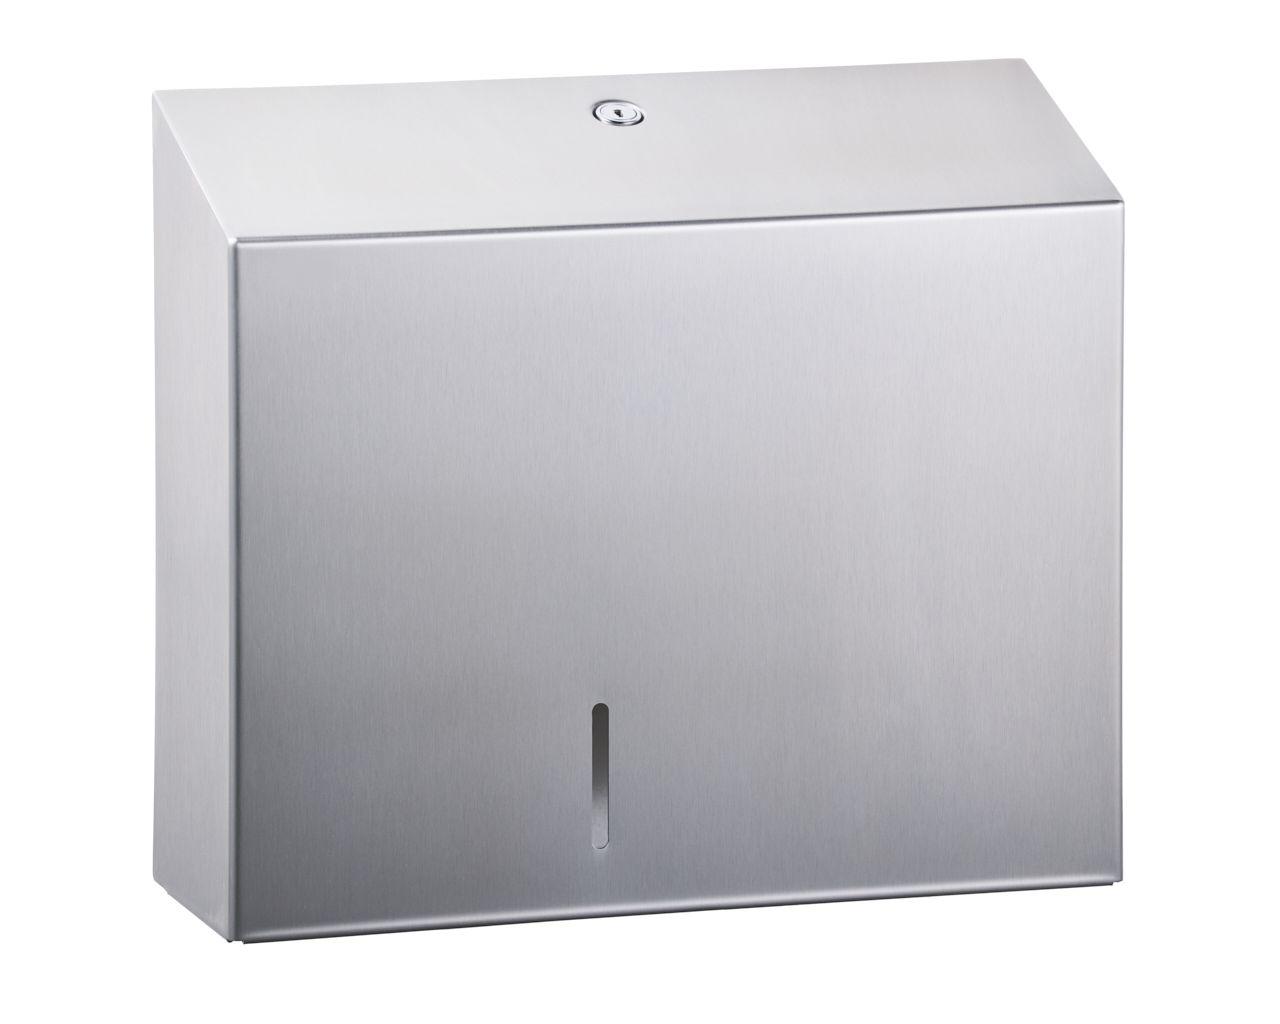 Fresh Toilettenpapierspender Maxi Jumbo Edelstahl